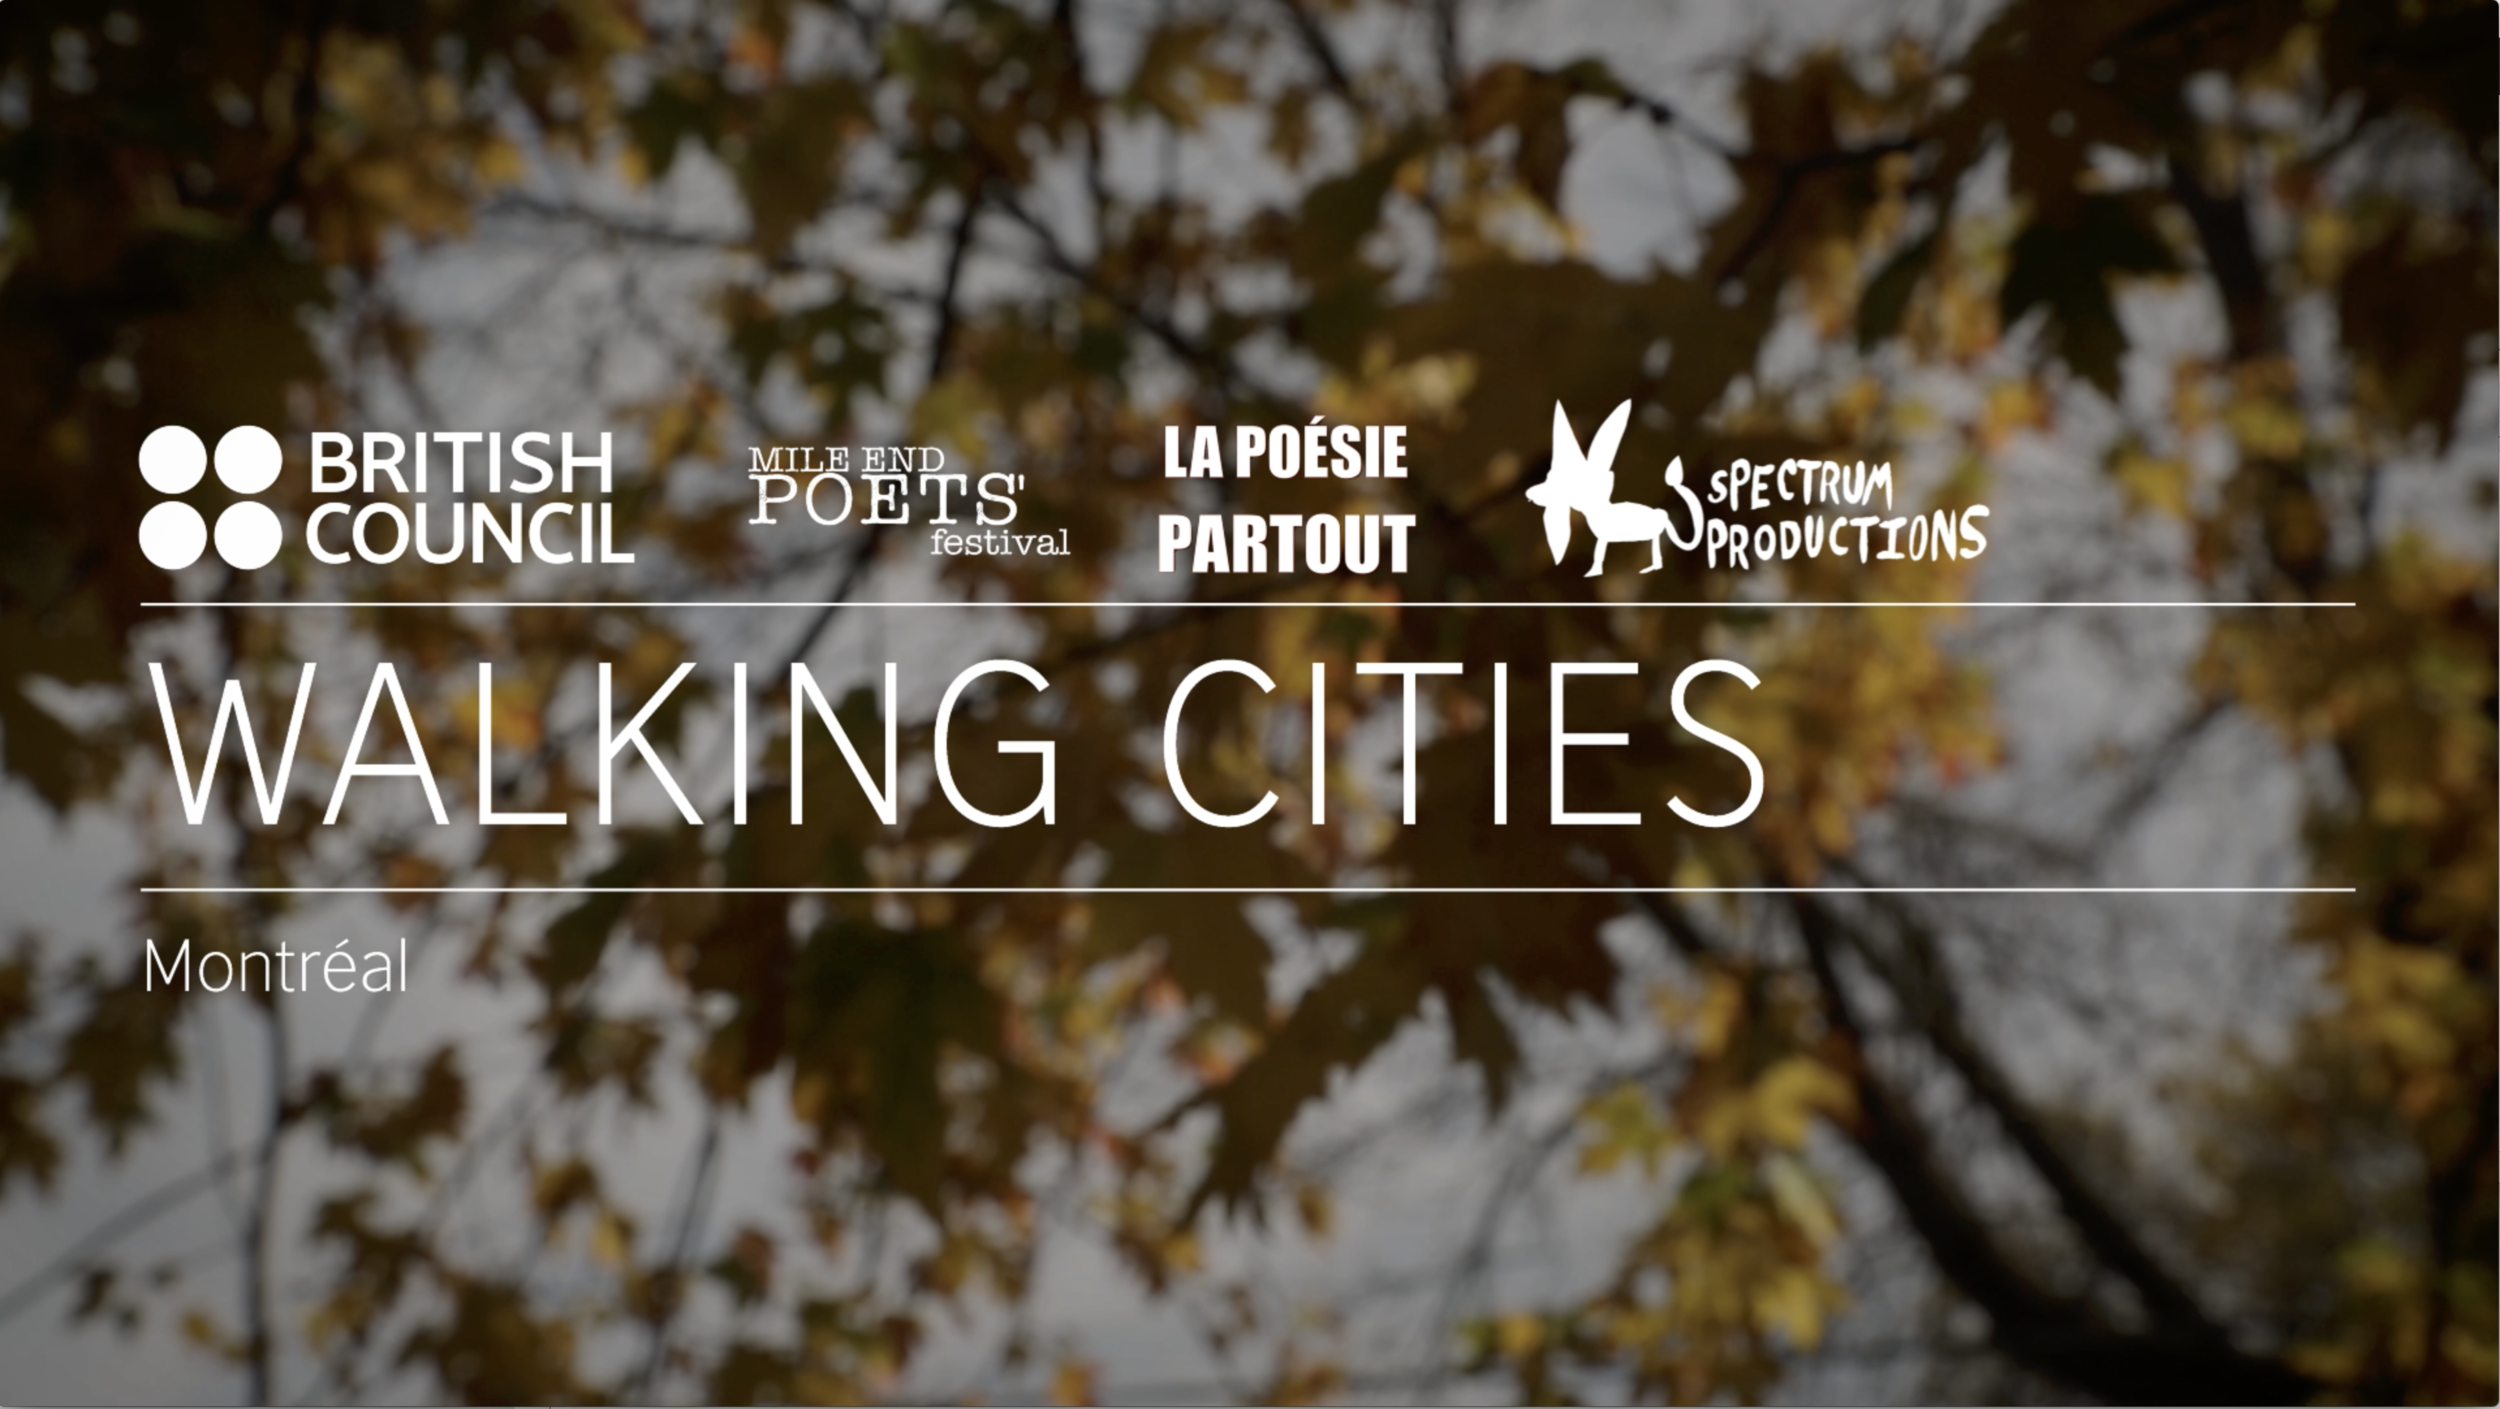 Walking Cities - British Council